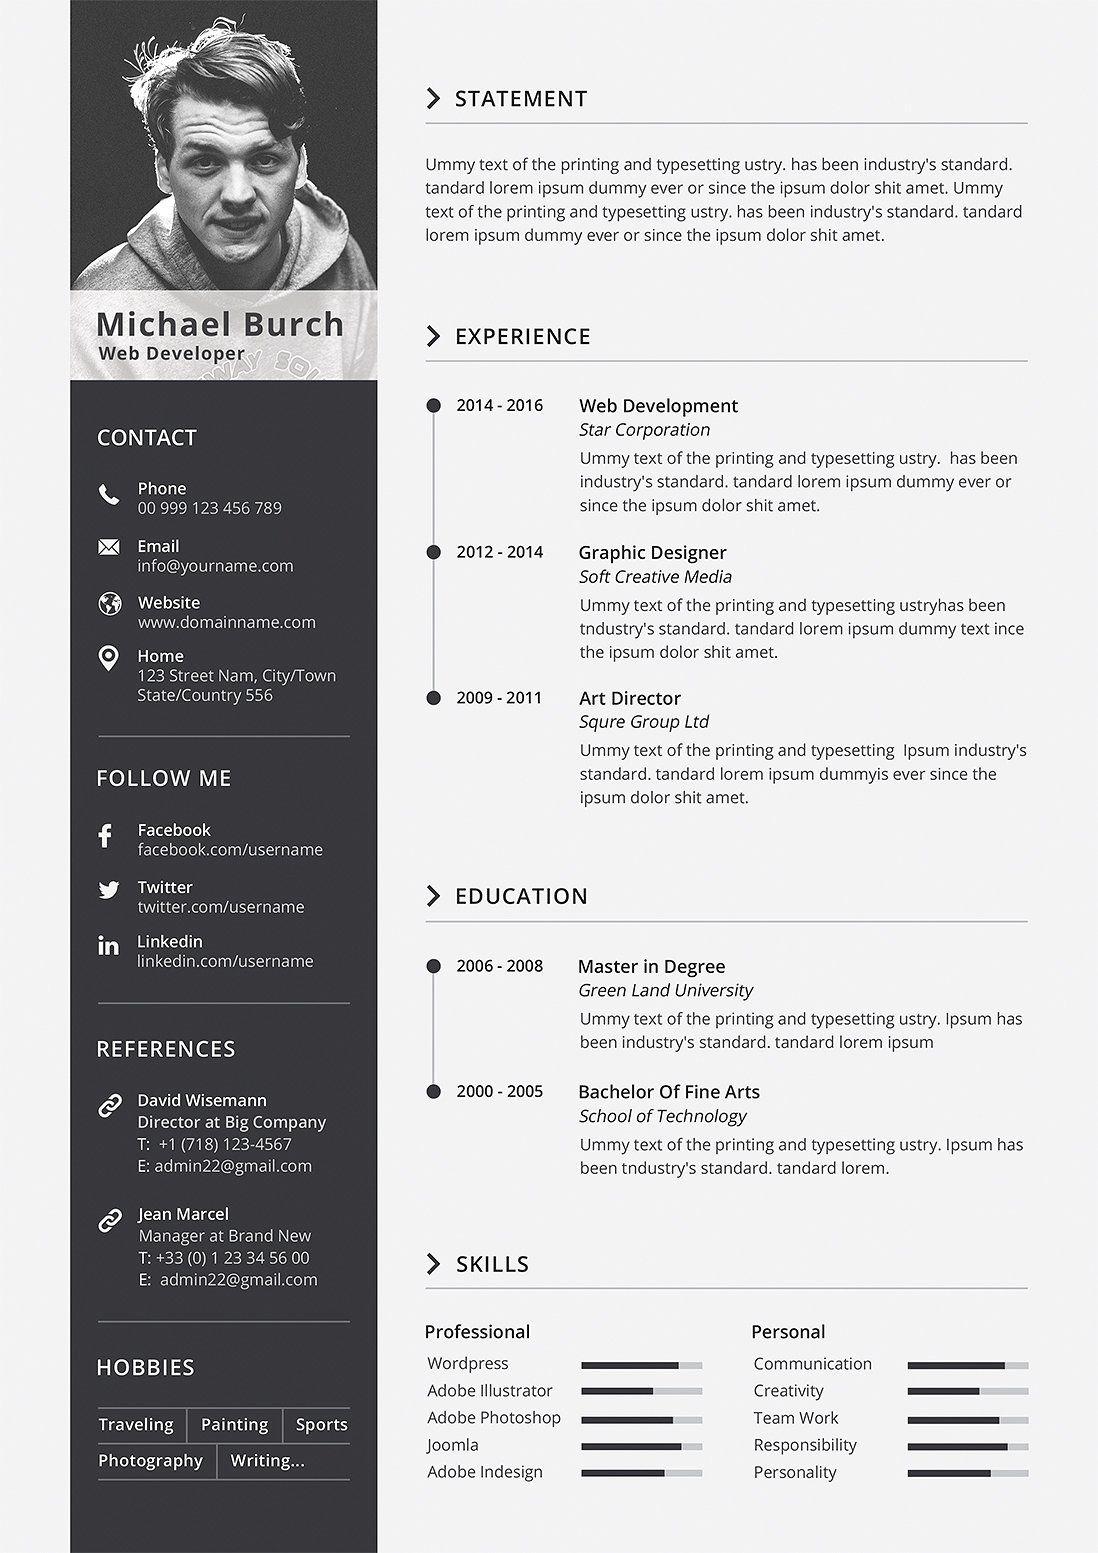 Minimal Cv Resume Graphic Design Resume Interior Design Resume Resume Design Template